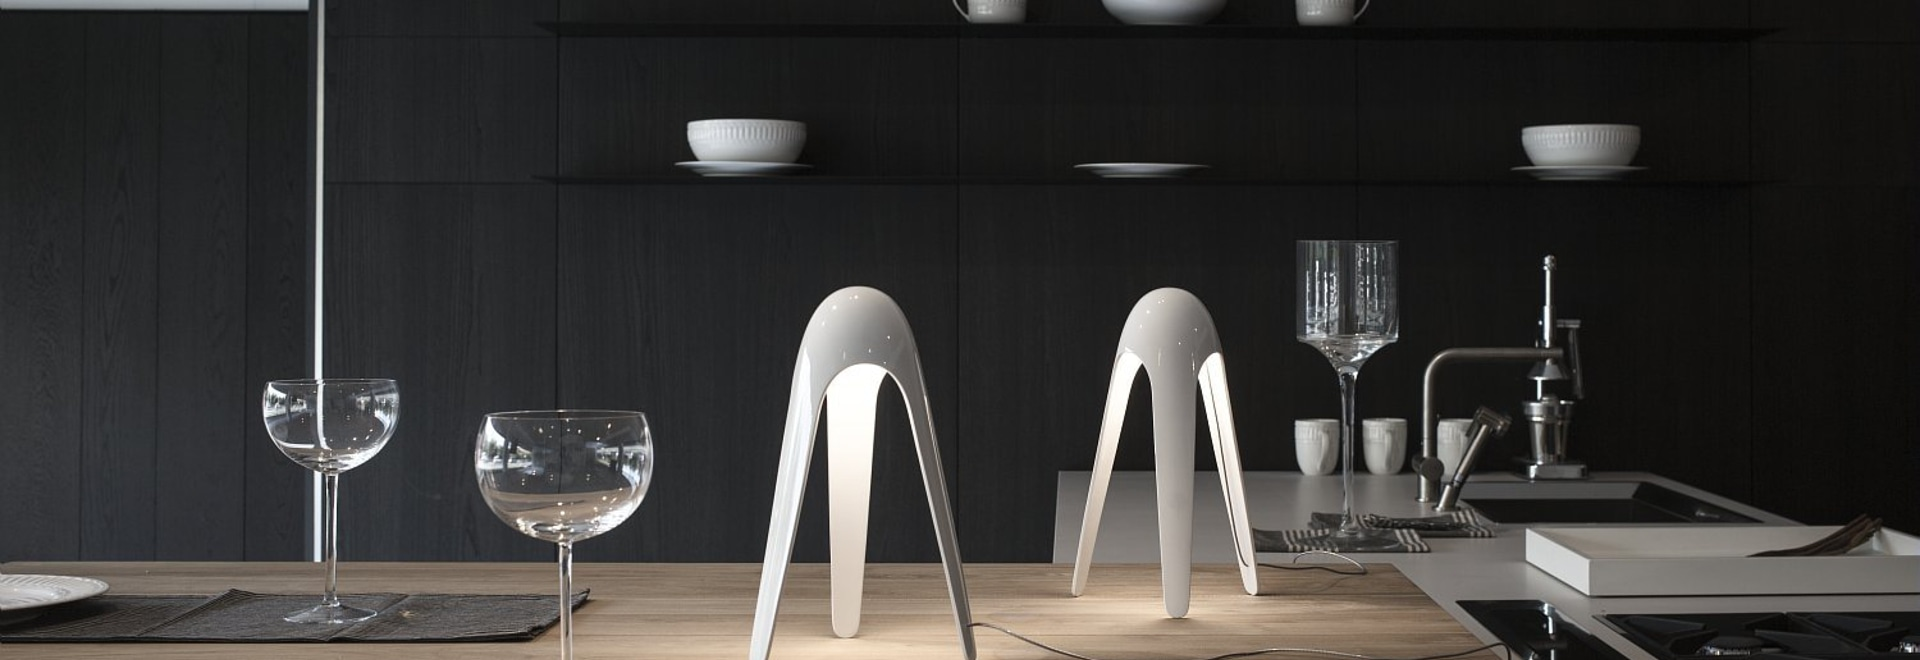 Martinelli Luce por primera vez en el _Londres de Designjunction